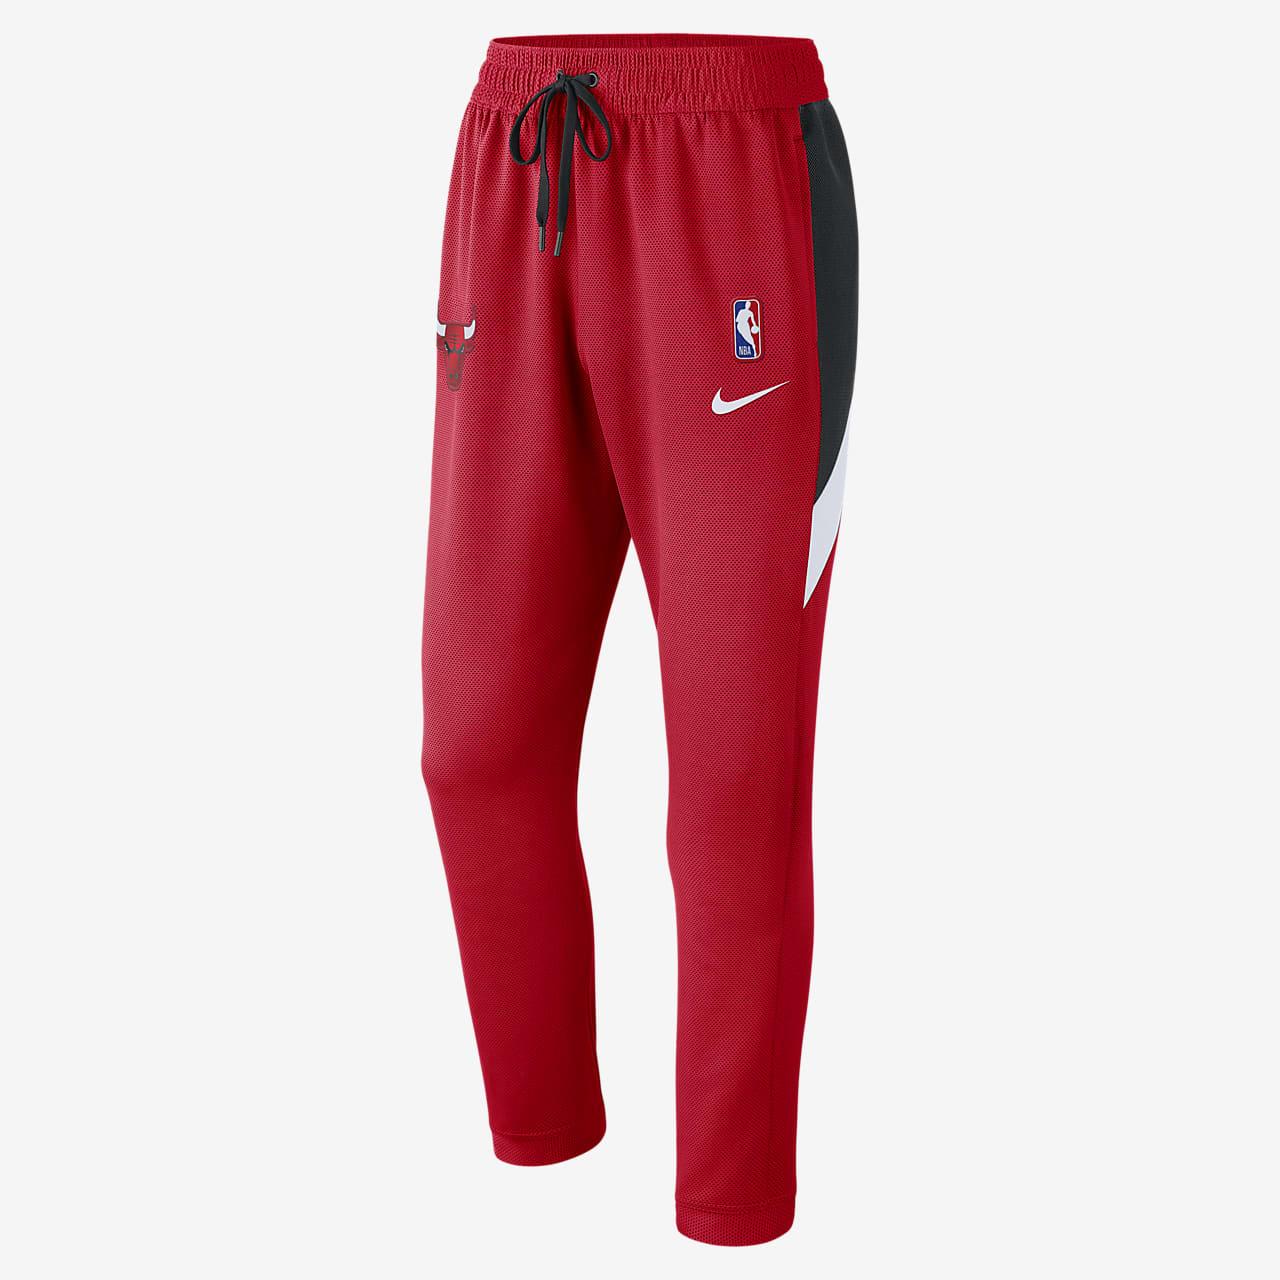 Pantalon NBA Chicago Bulls Nike Therma Flex Showtime pour Homme